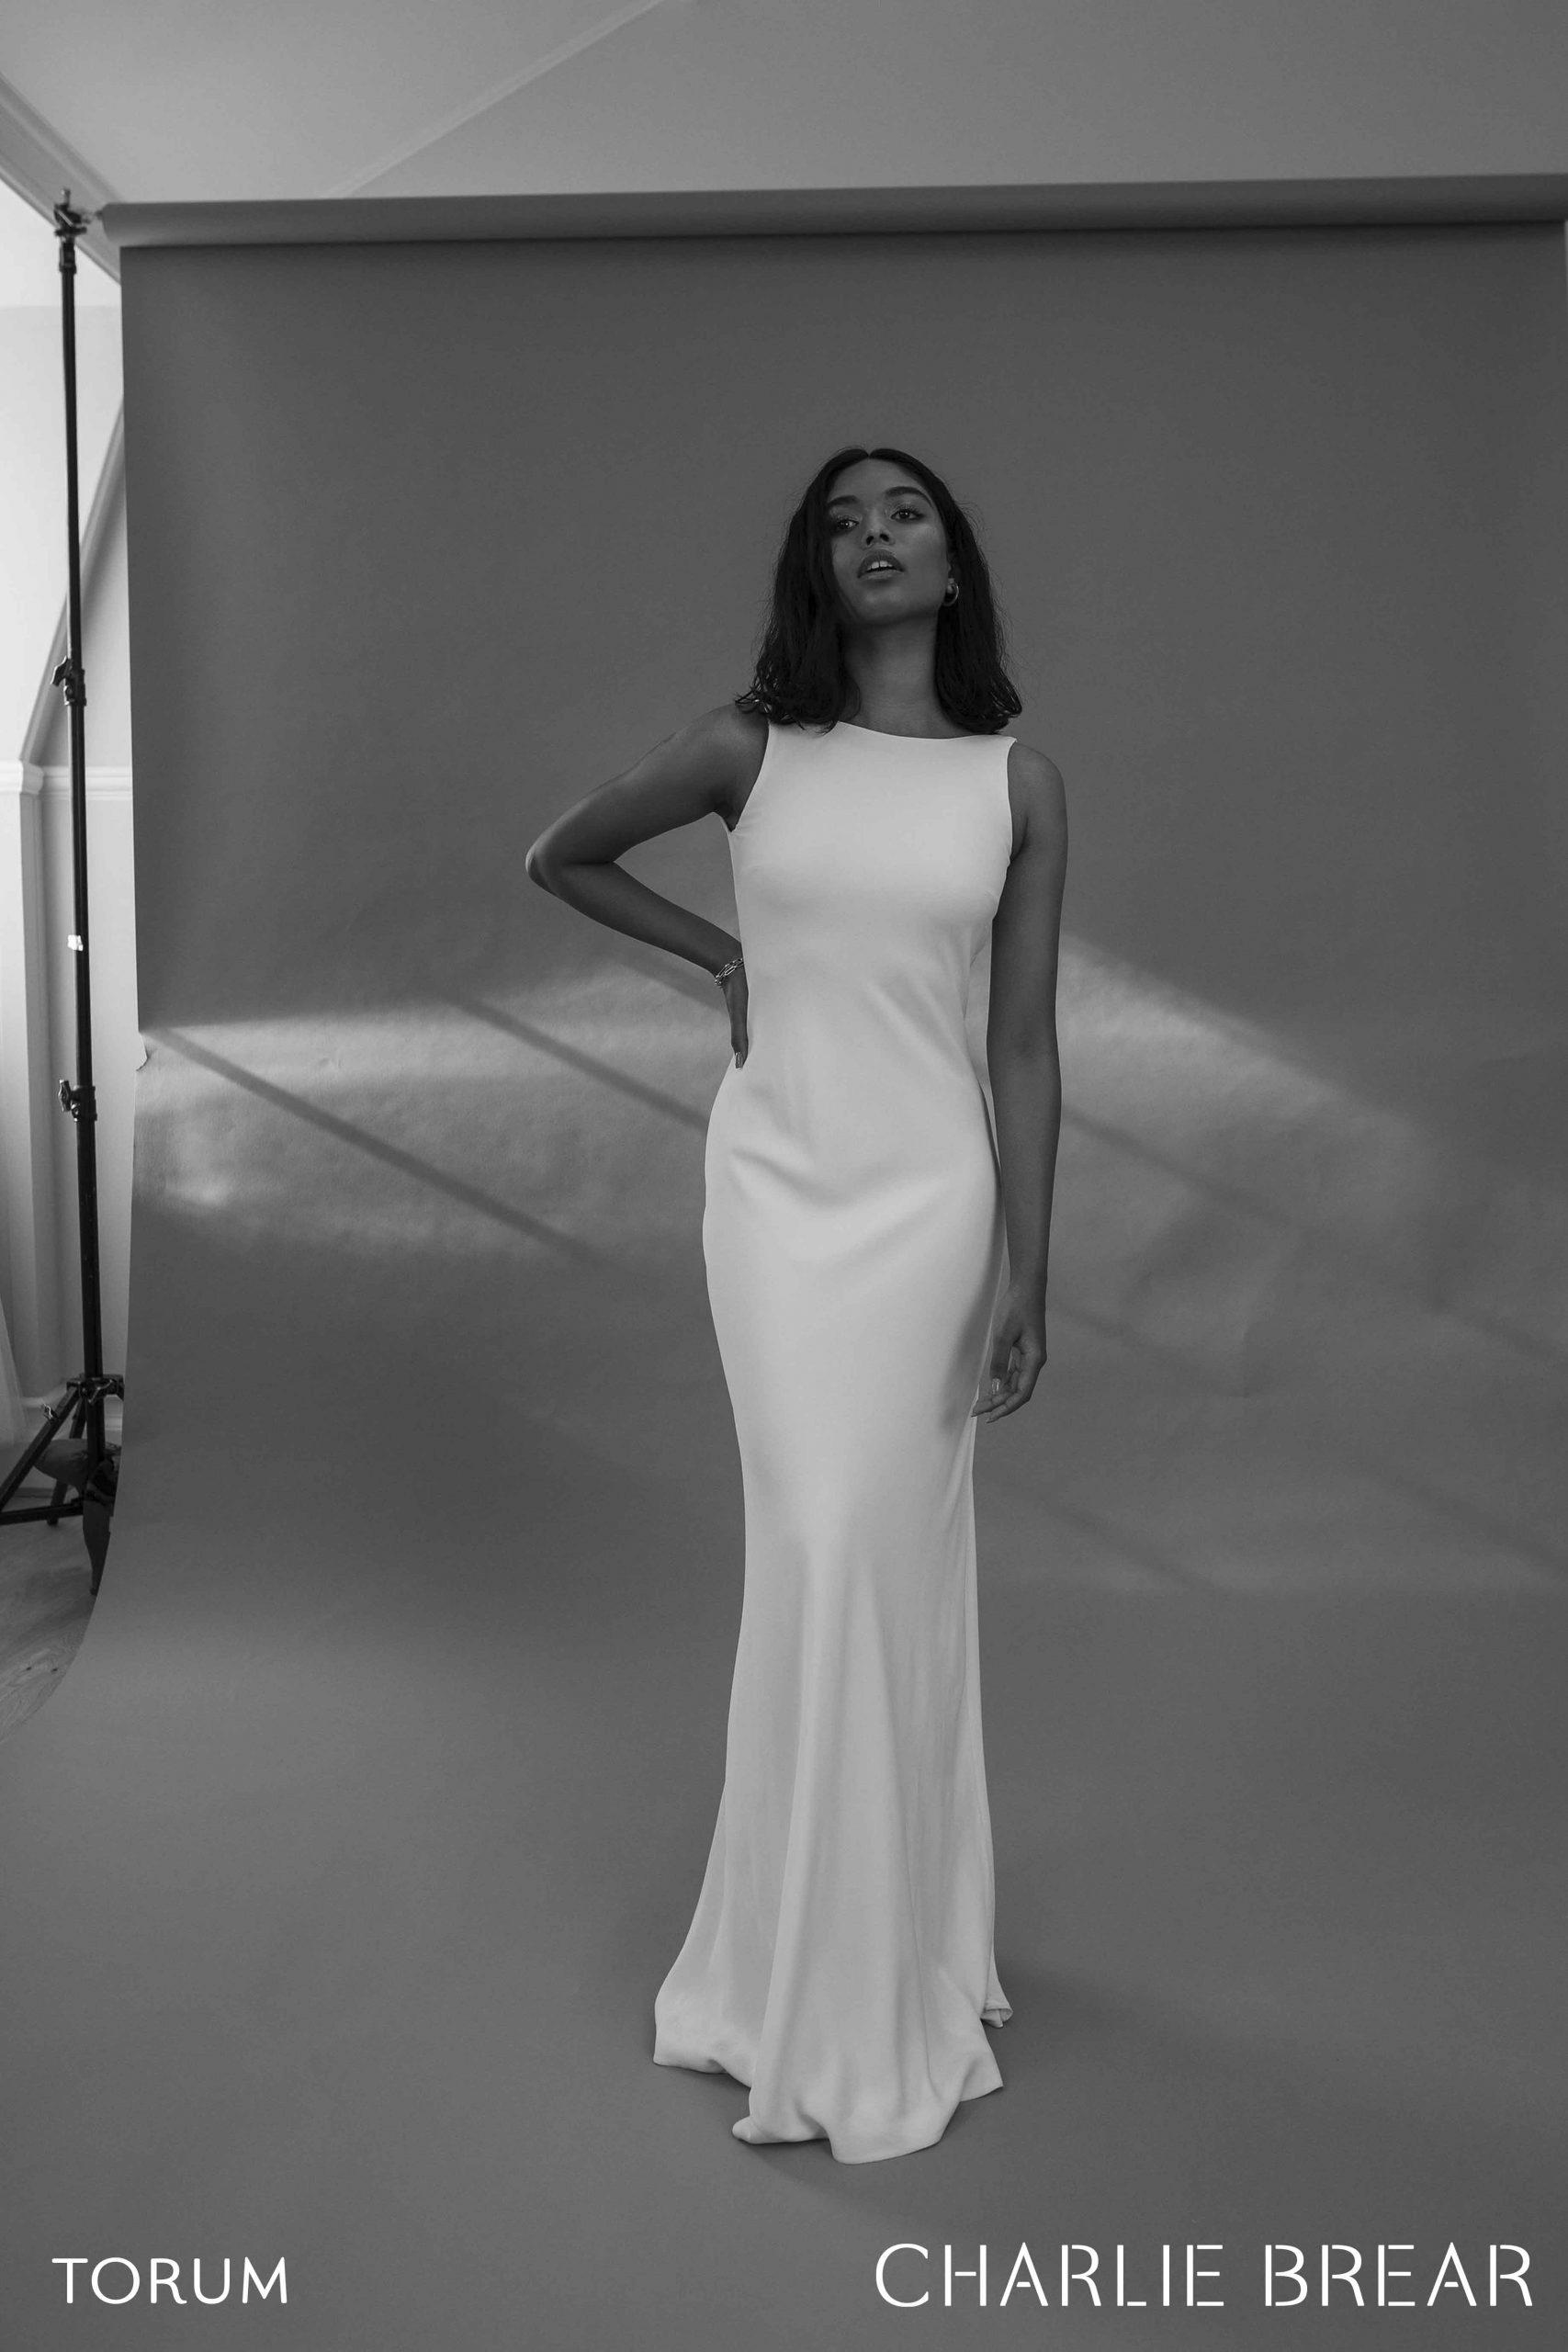 Torum Dress